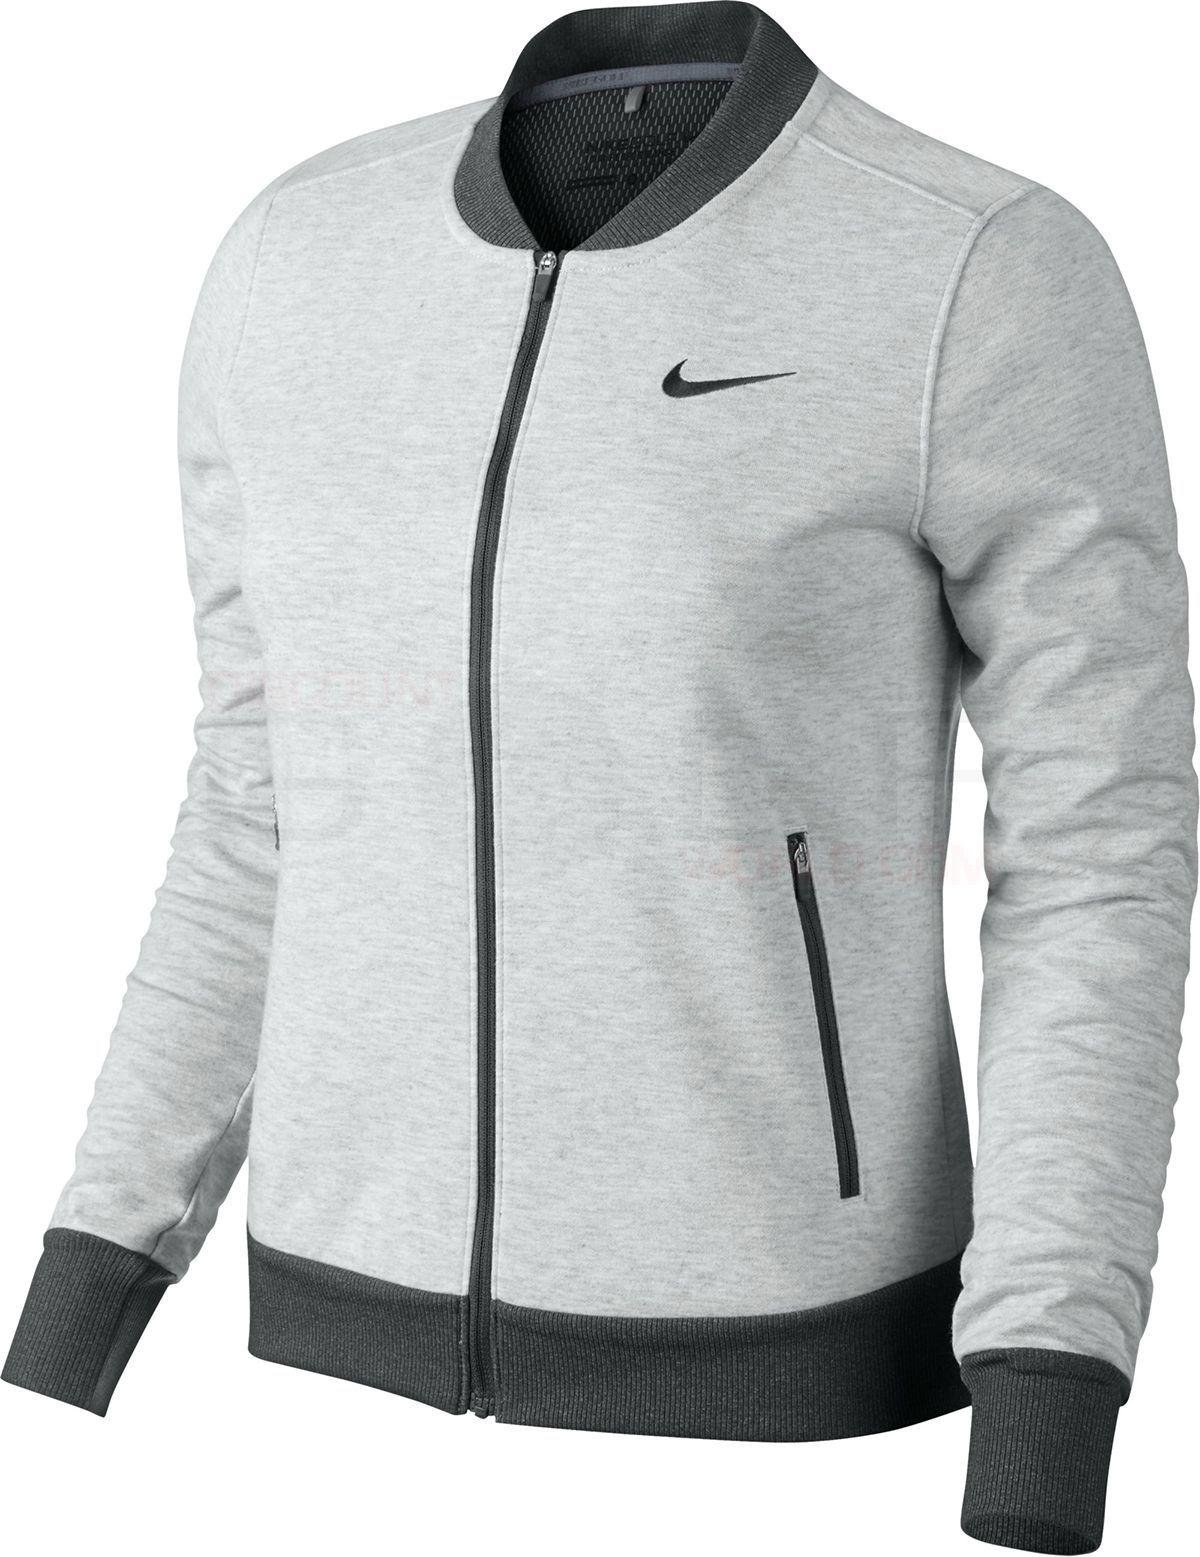 Nike jacket gray and black - Nike Women S Wool Bonded Bomber Jacket 685301 Discount Golf World